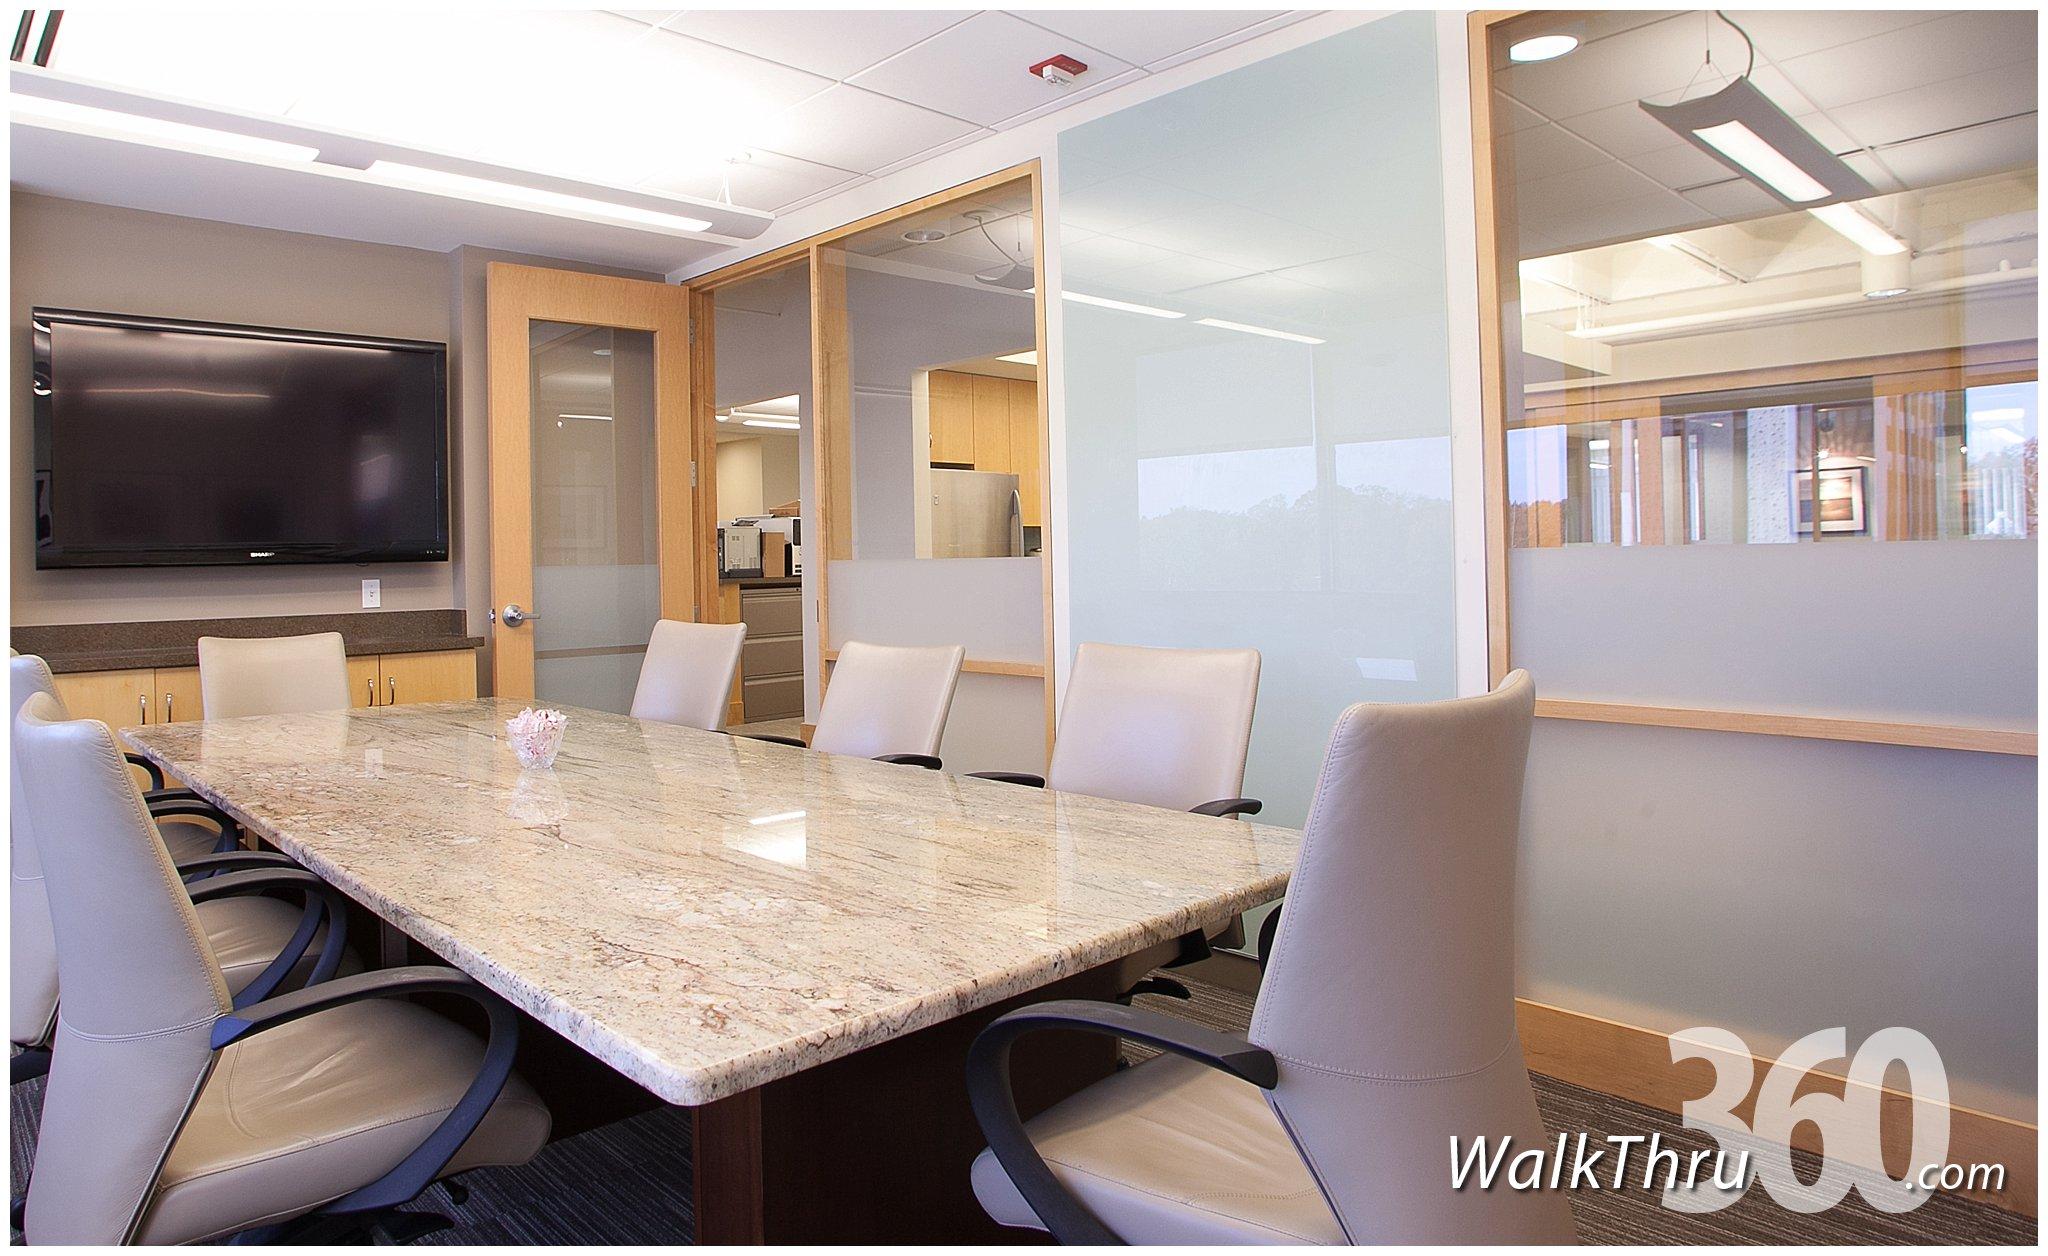 Google 360 Examples Professional Offices Walkthru360